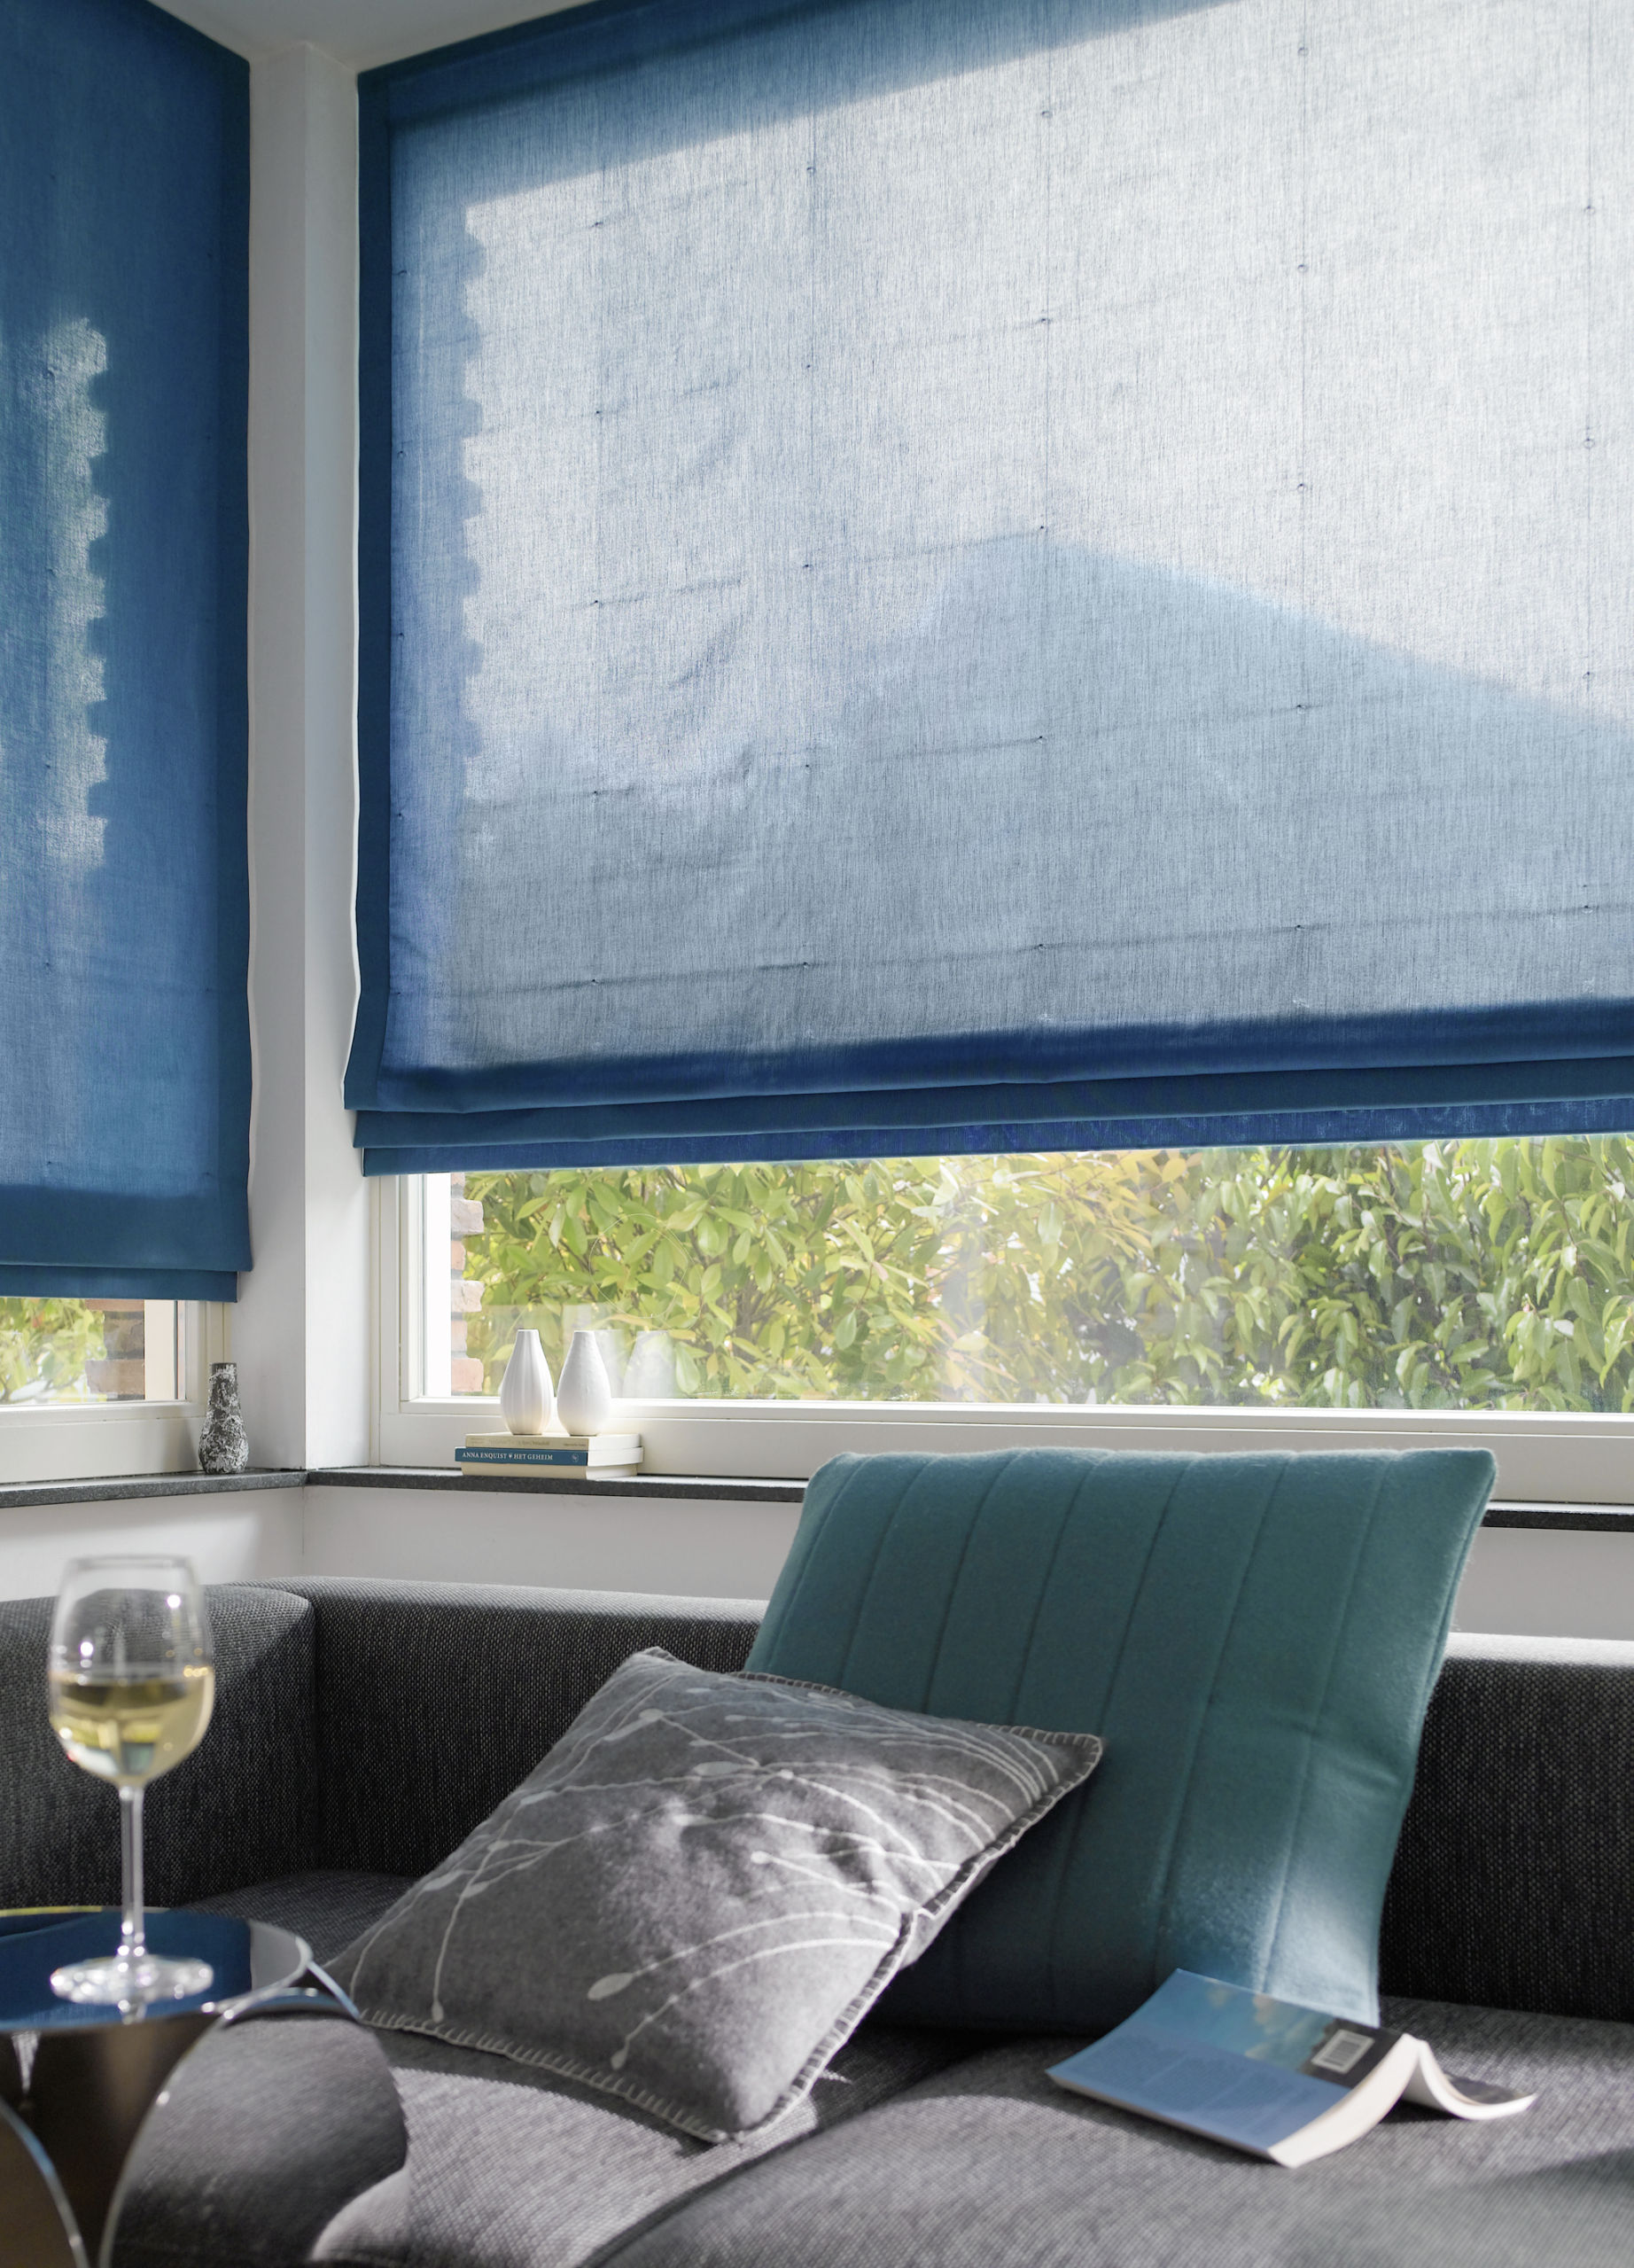 raffrollos raumausstattung gauweiler speyer. Black Bedroom Furniture Sets. Home Design Ideas